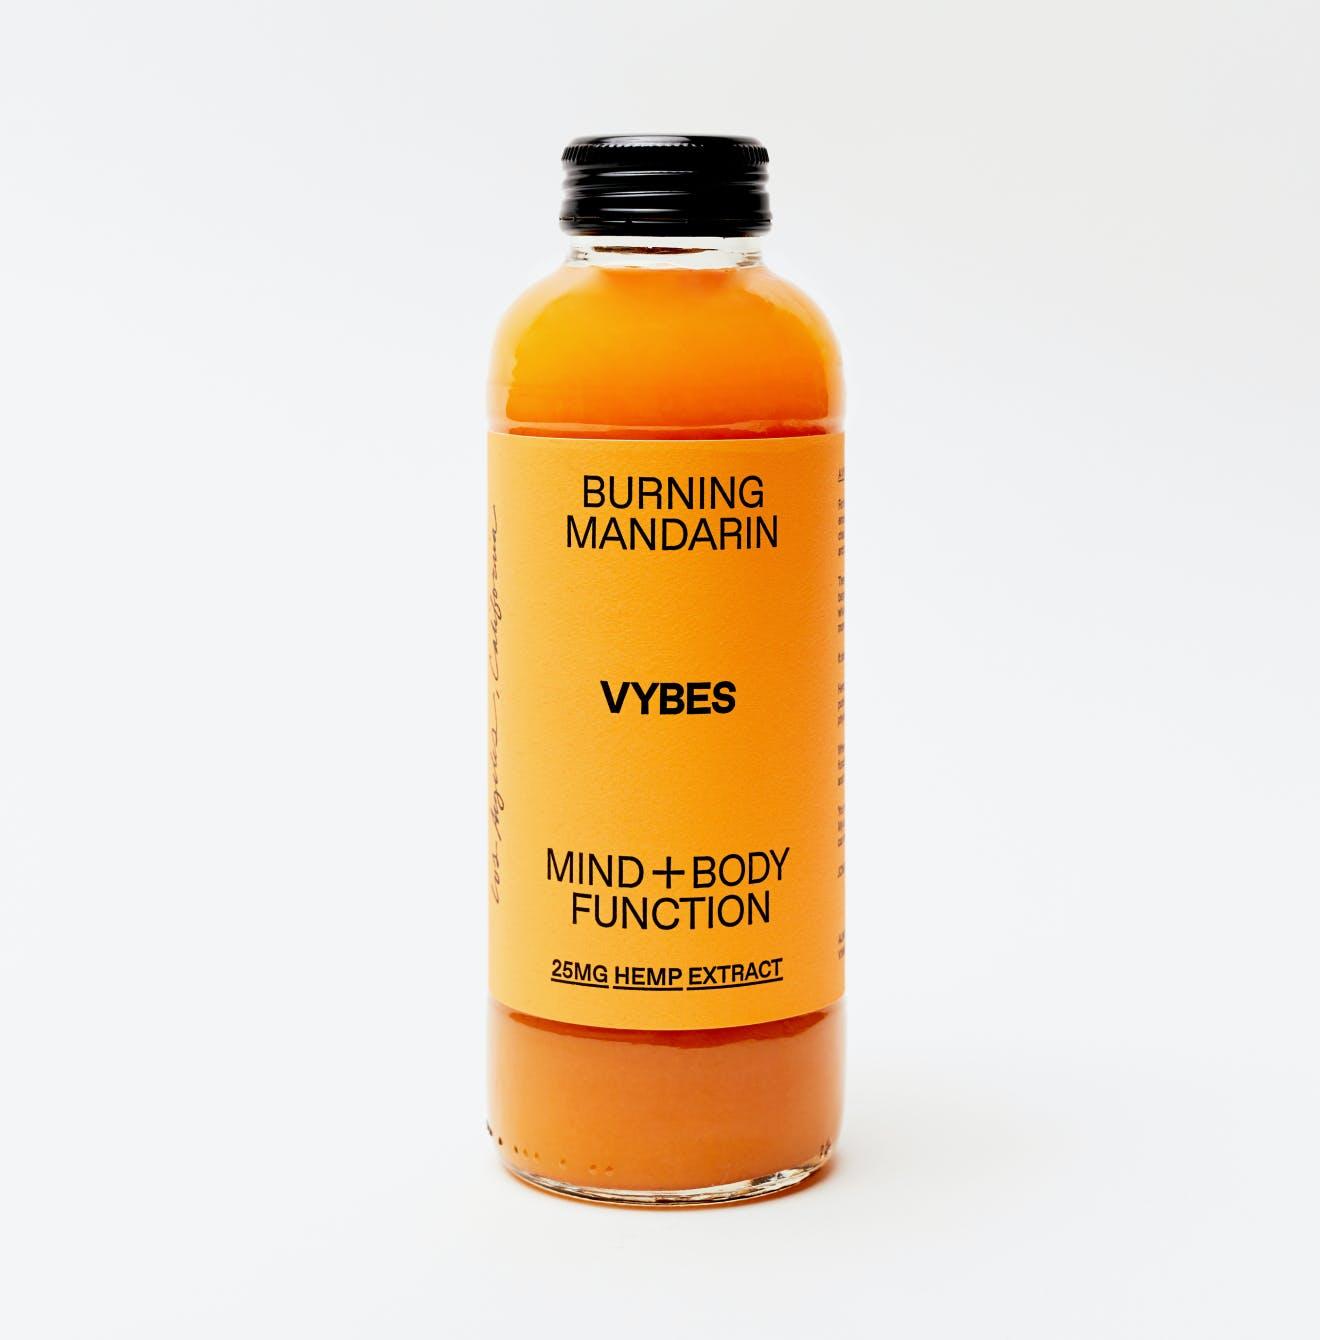 Burning Mandarin VYBES 2